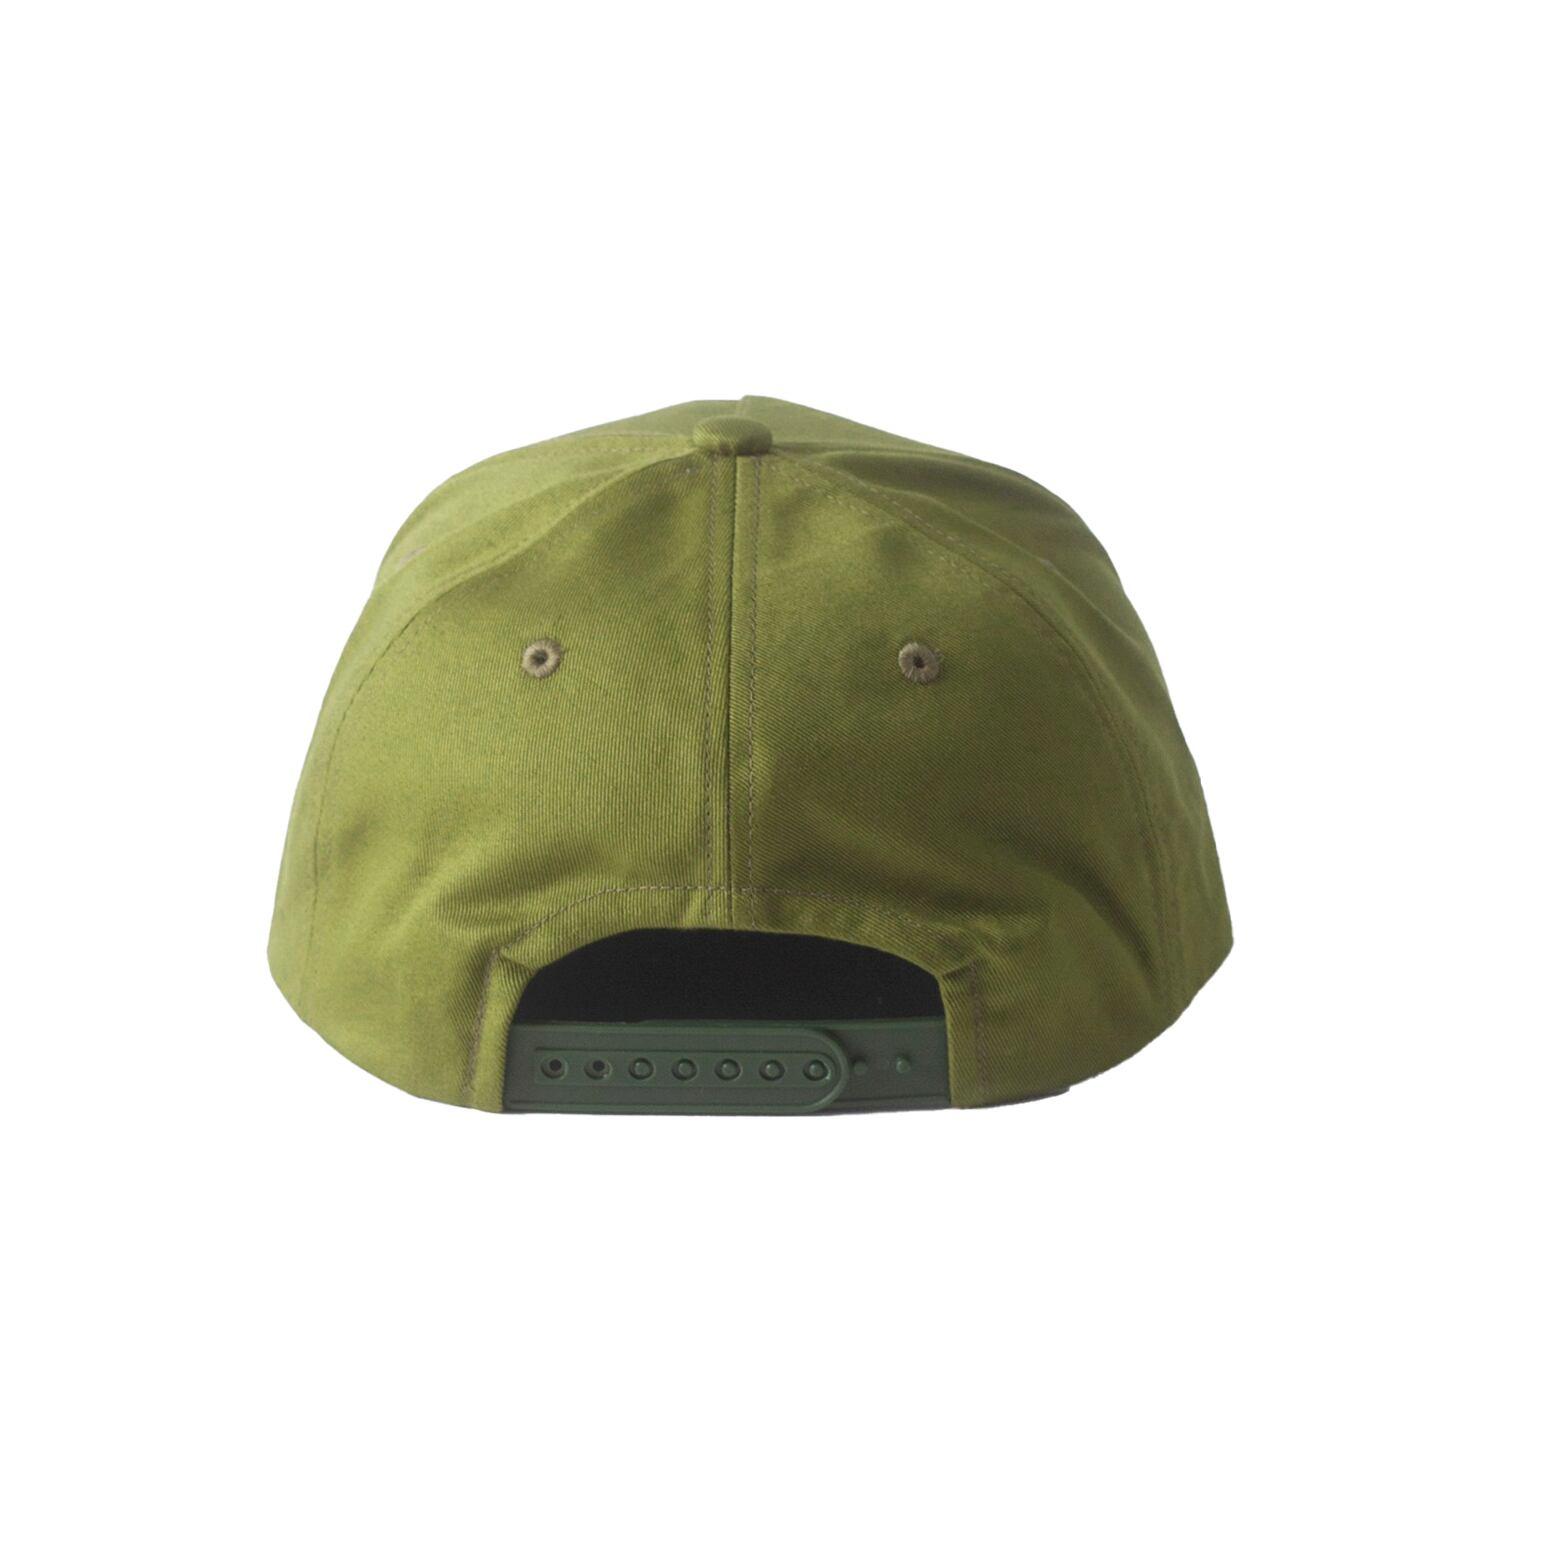 NEW COMMUNE 5 PANEL CAP / GREEN - 画像3